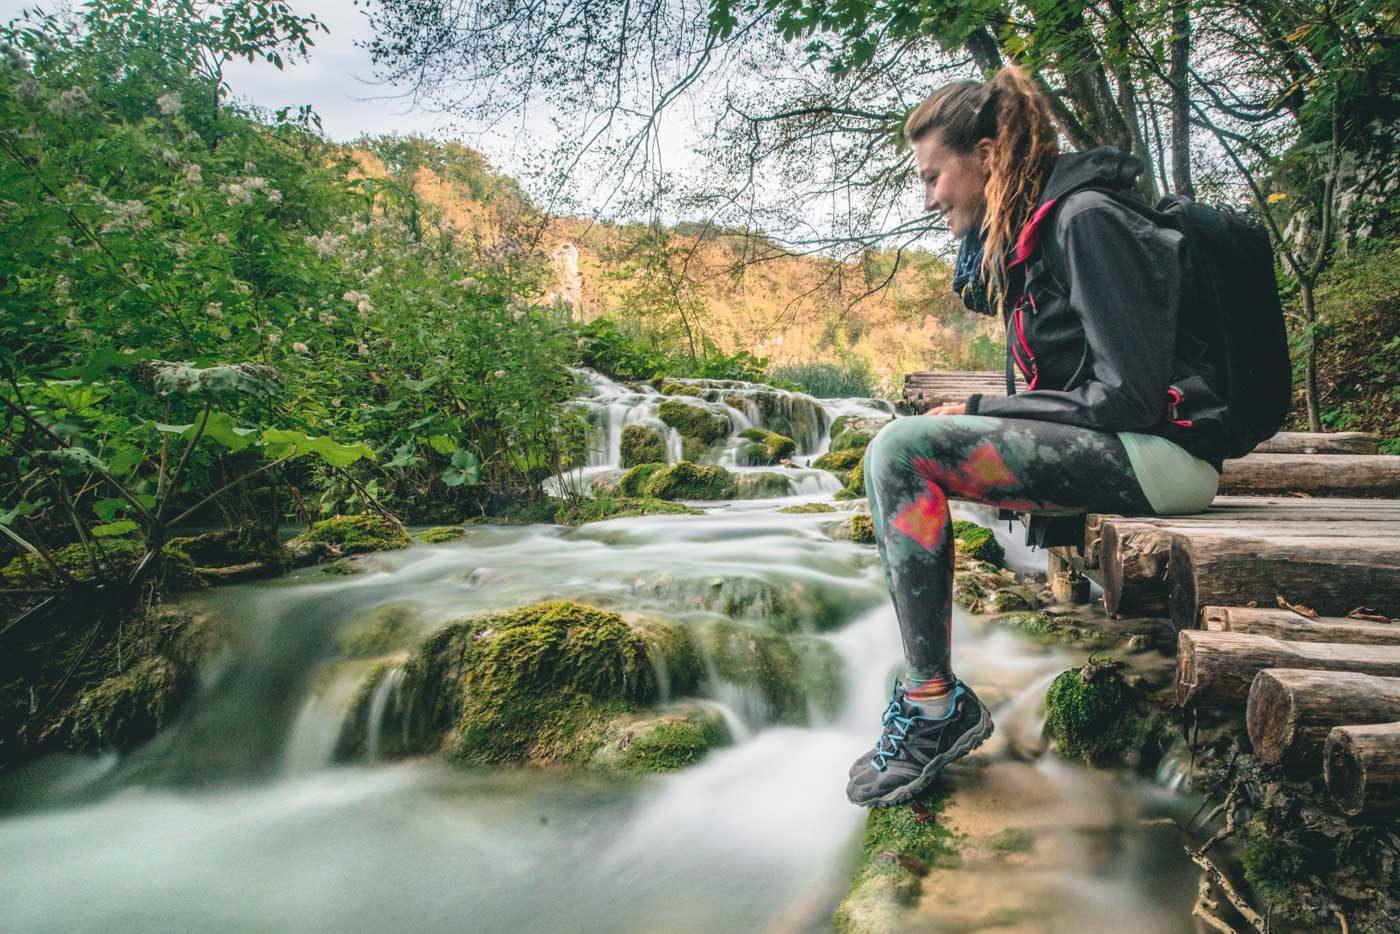 Oksana wearing Teeki hot pants on a hike in Plitvice National Park in Croatia